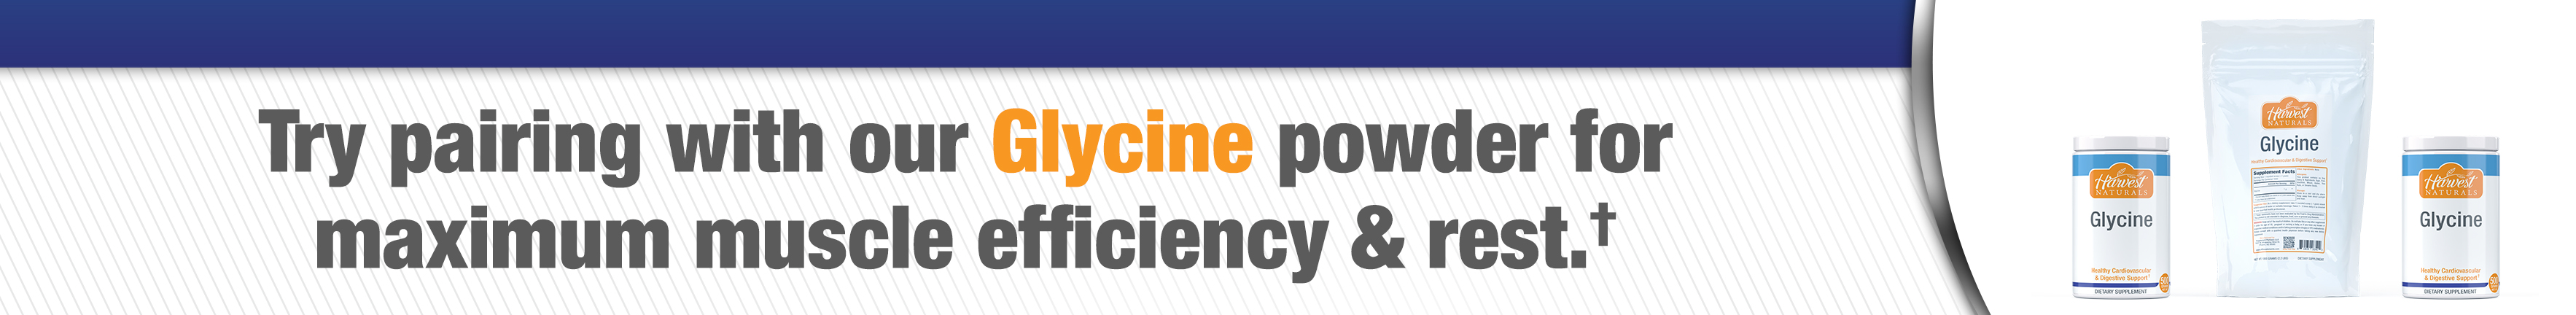 glycine-consider-10-21.jpg